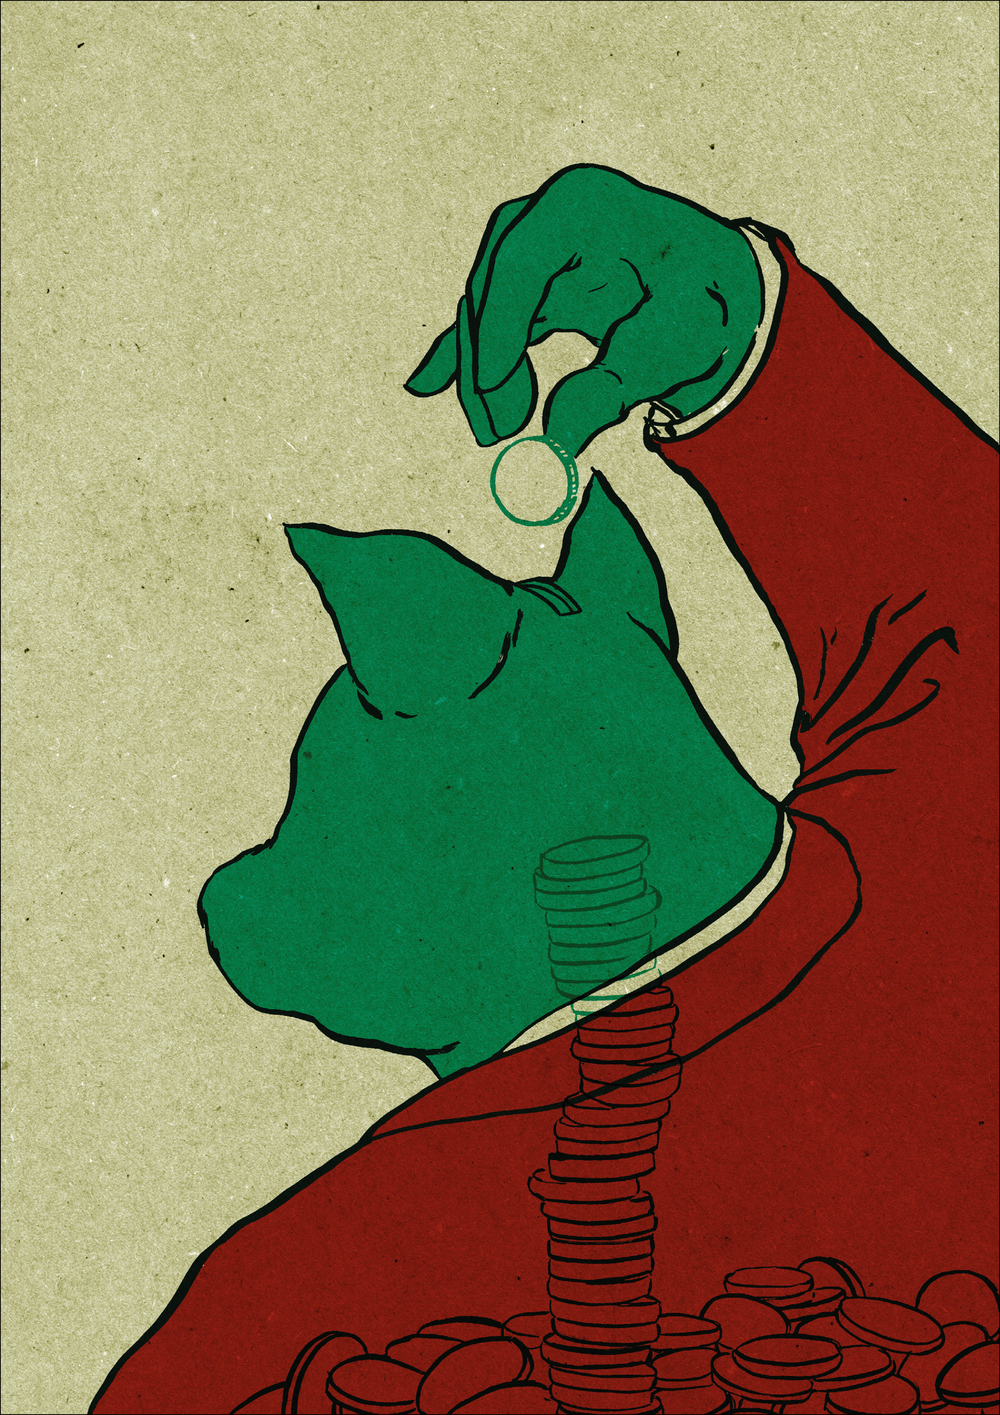 Matteo Brasili - L'autoalimentazione